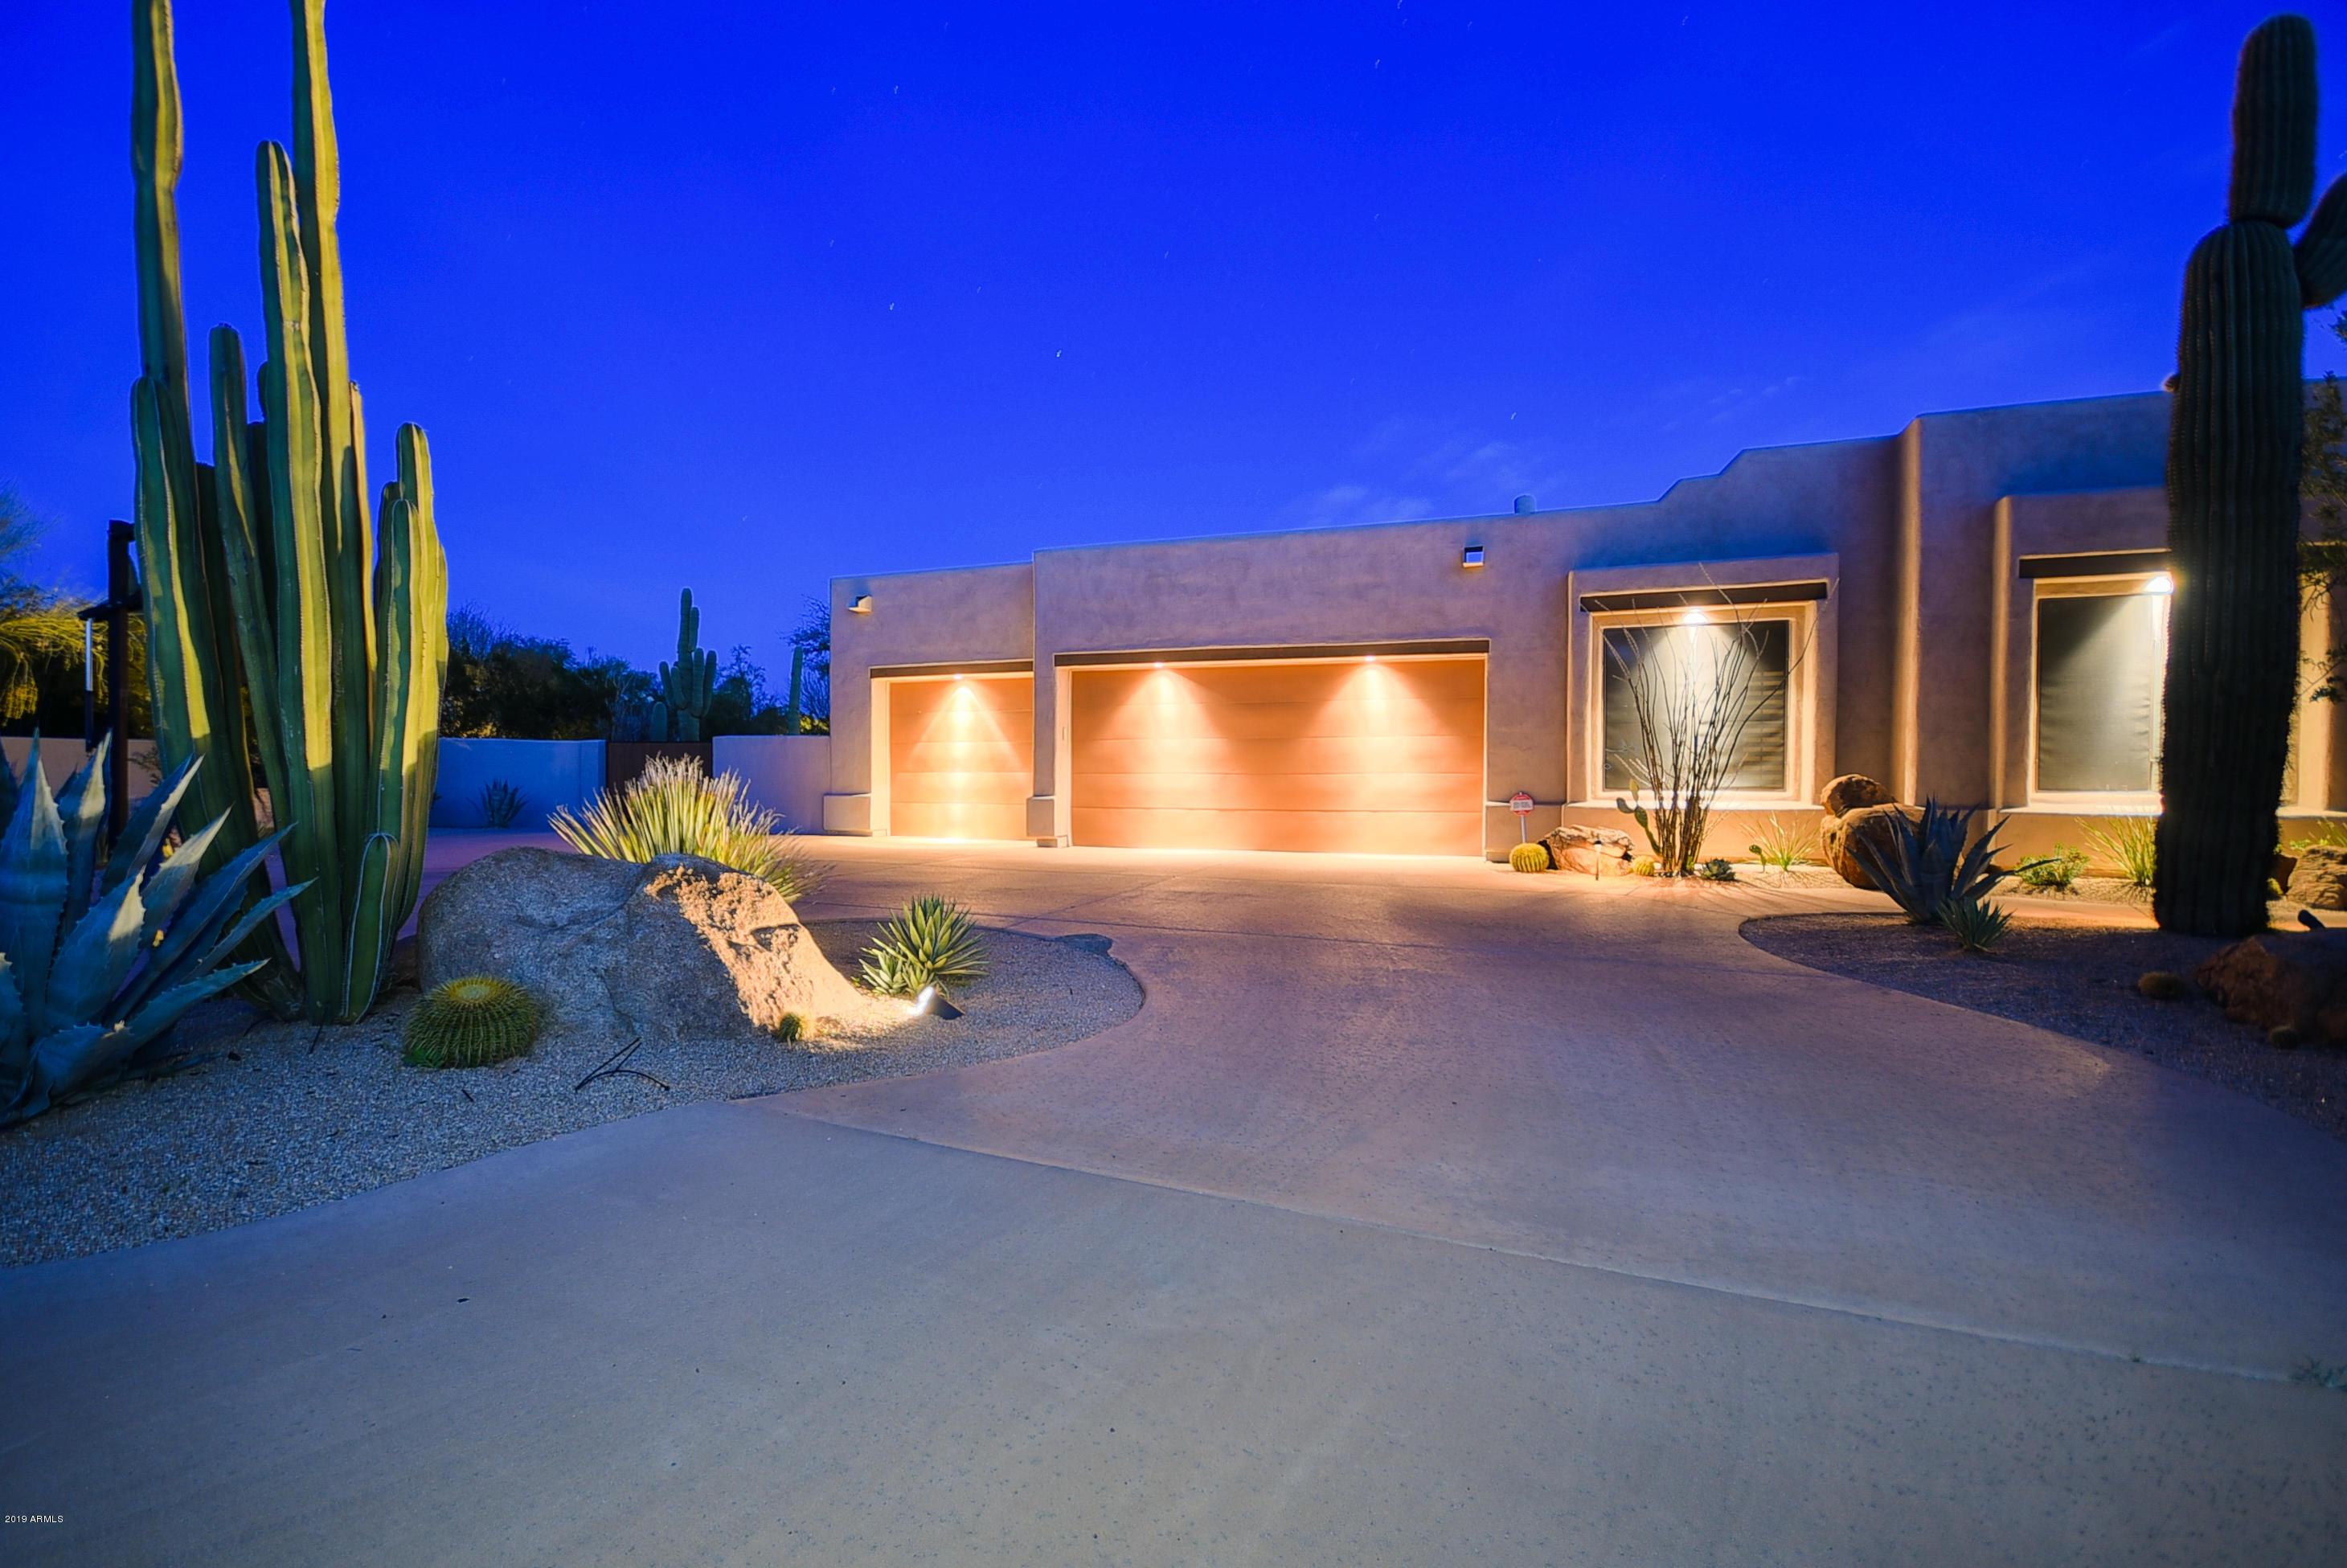 MLS 5896567 22213 N 81ST Street, Scottsdale, AZ 85255 Scottsdale AZ Pinnacle Peak Estates